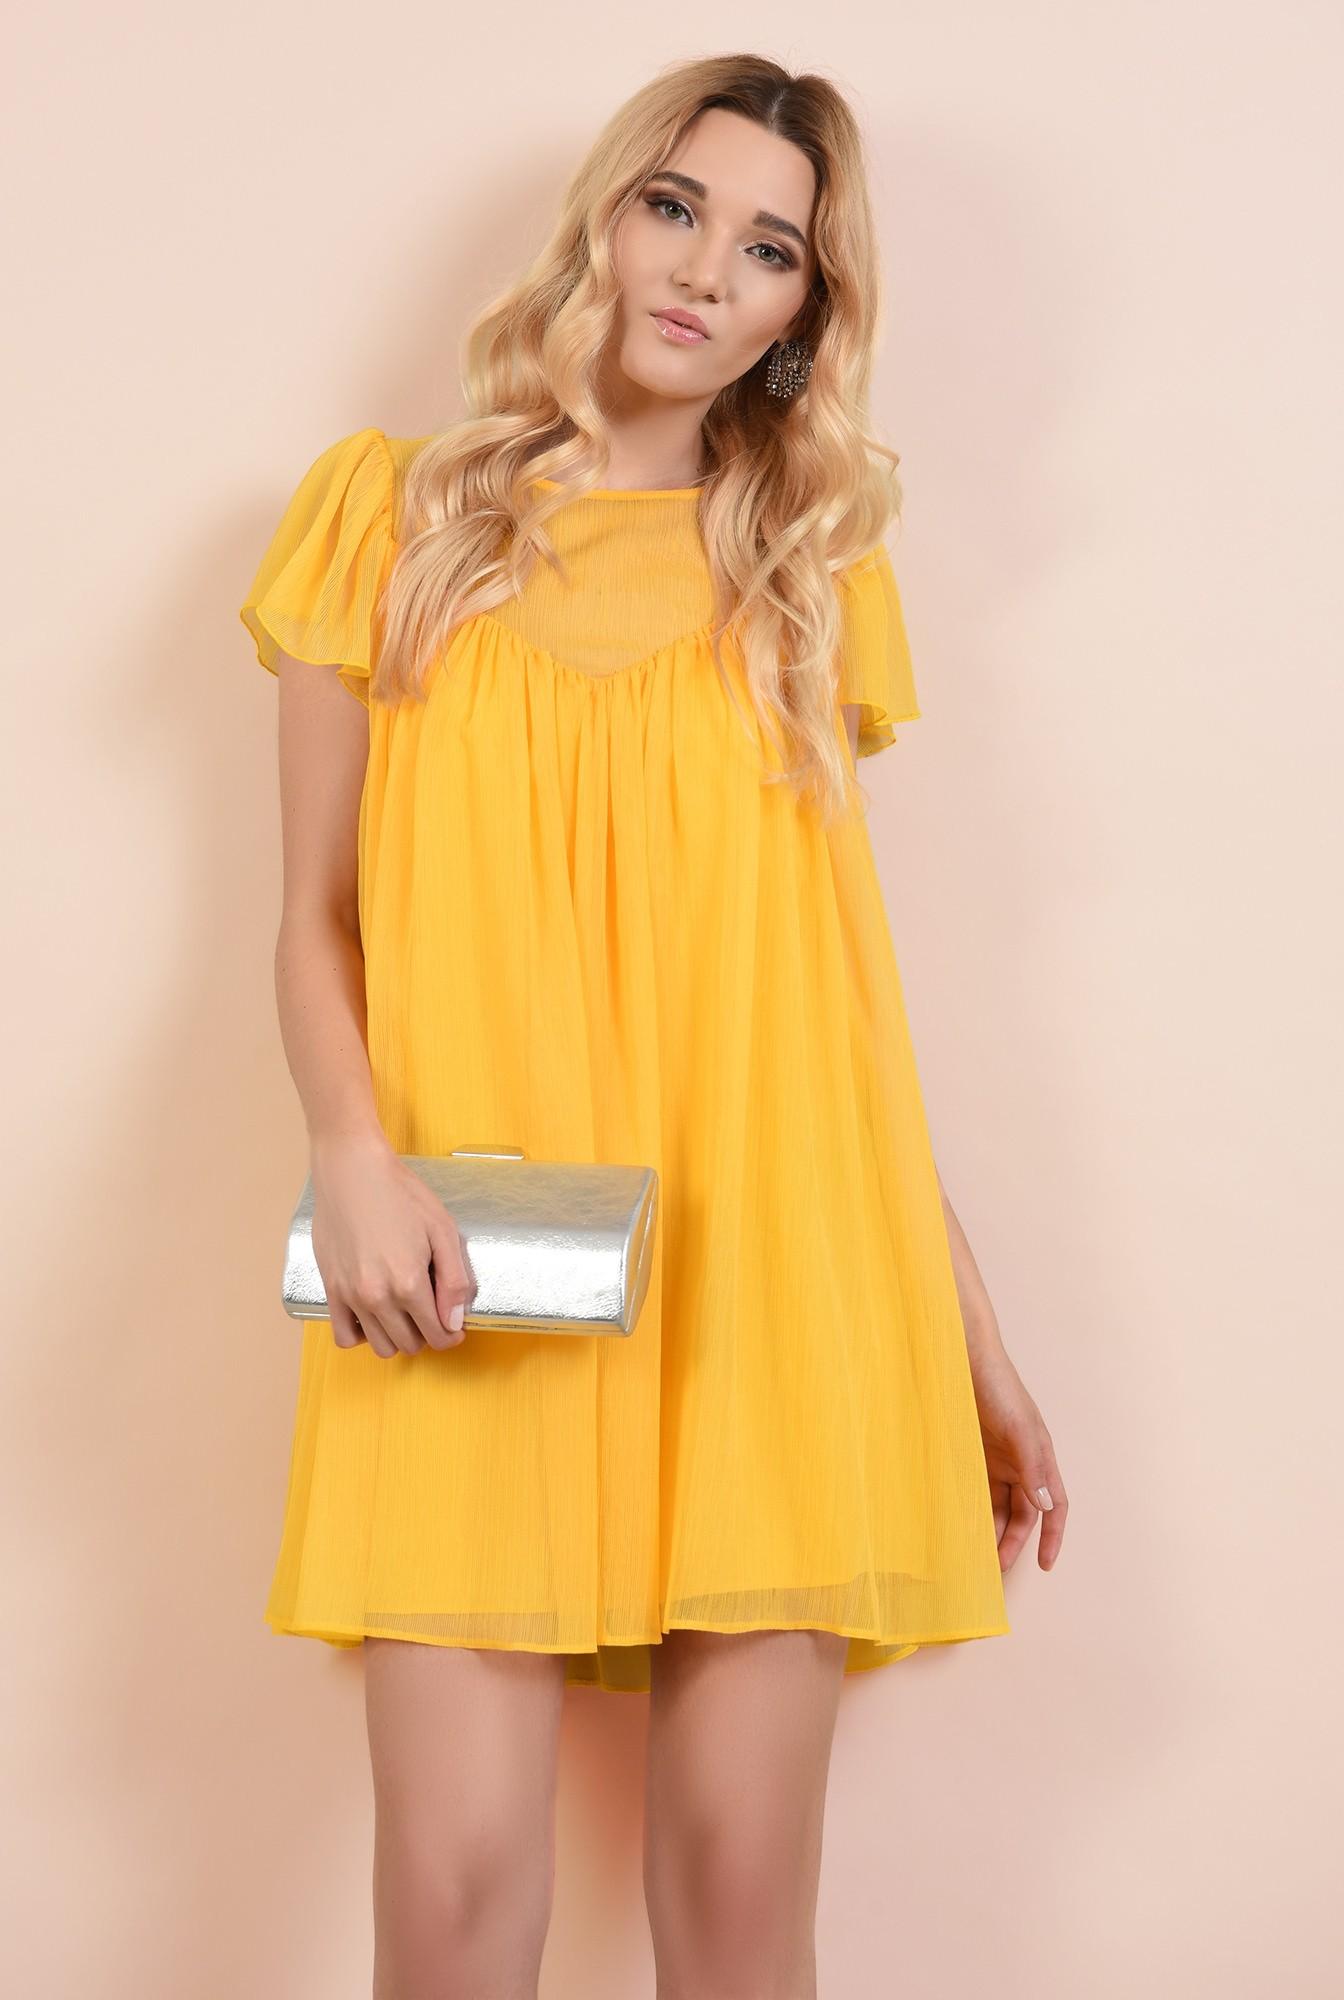 0 - rochie eleganta din voal, rochii online, croi lejer, scurta, maneci evazate